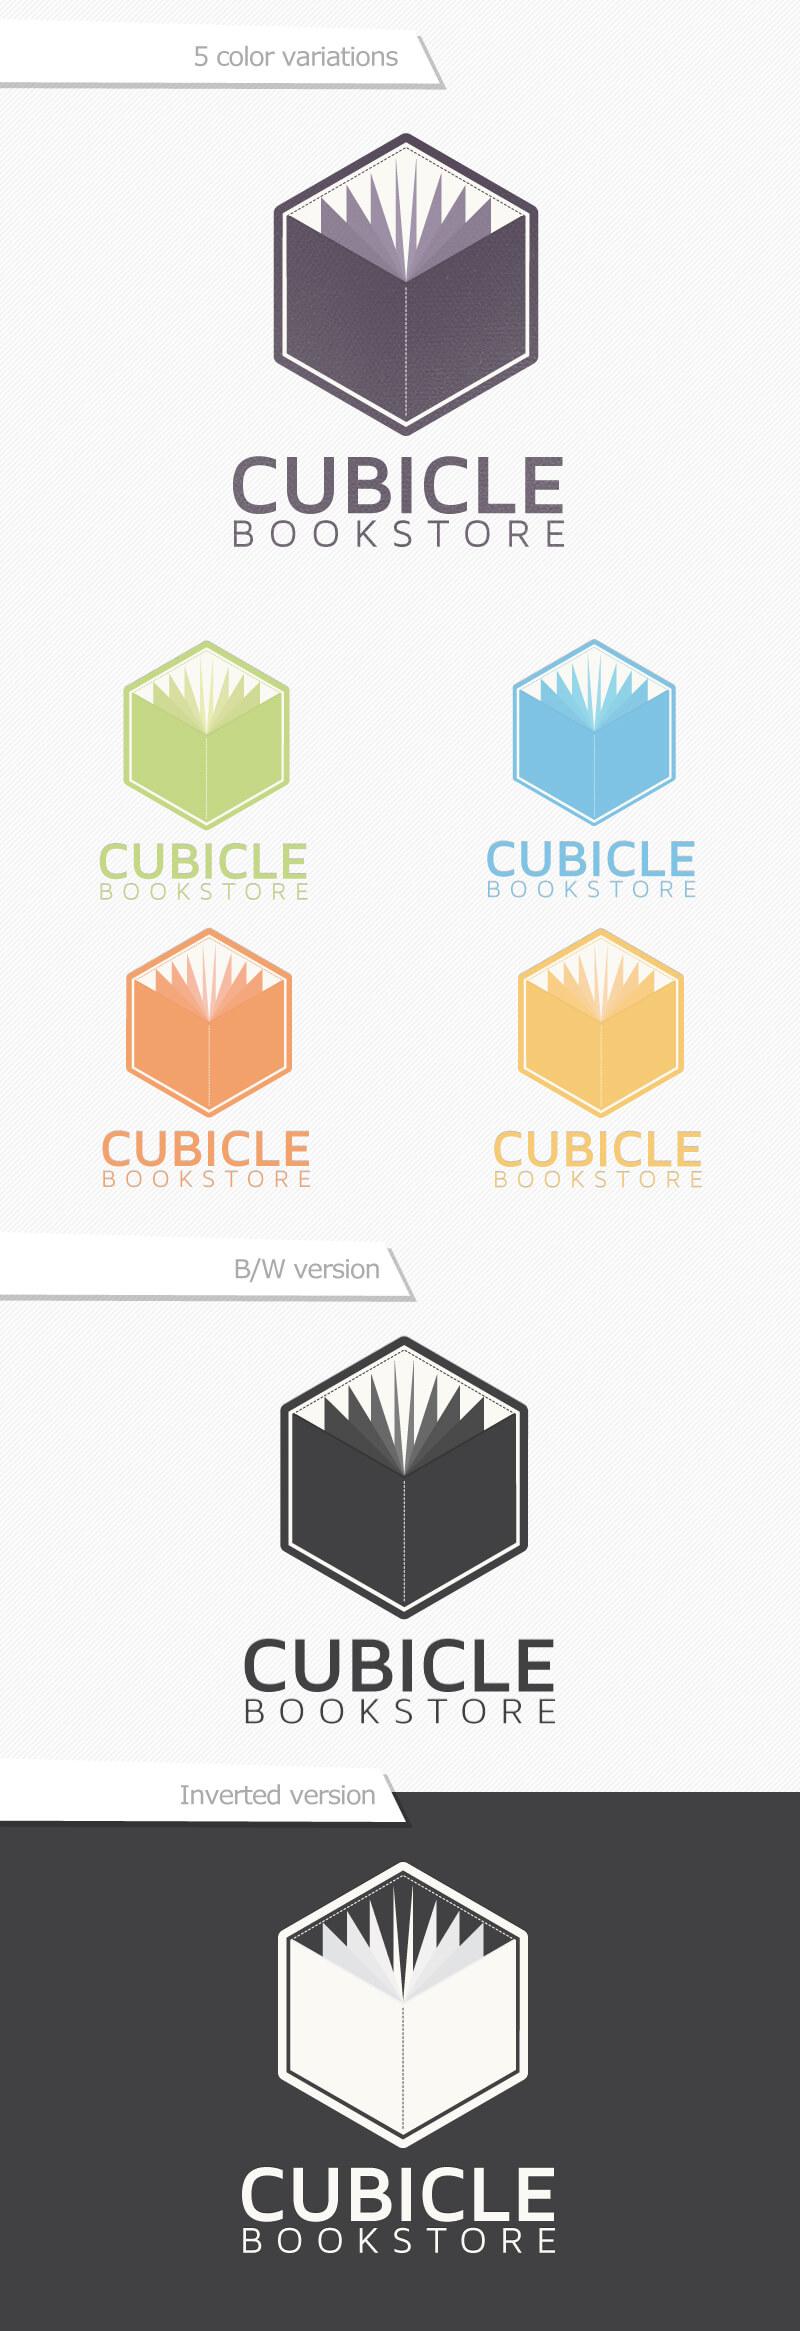 Cubicle Bookstore logo